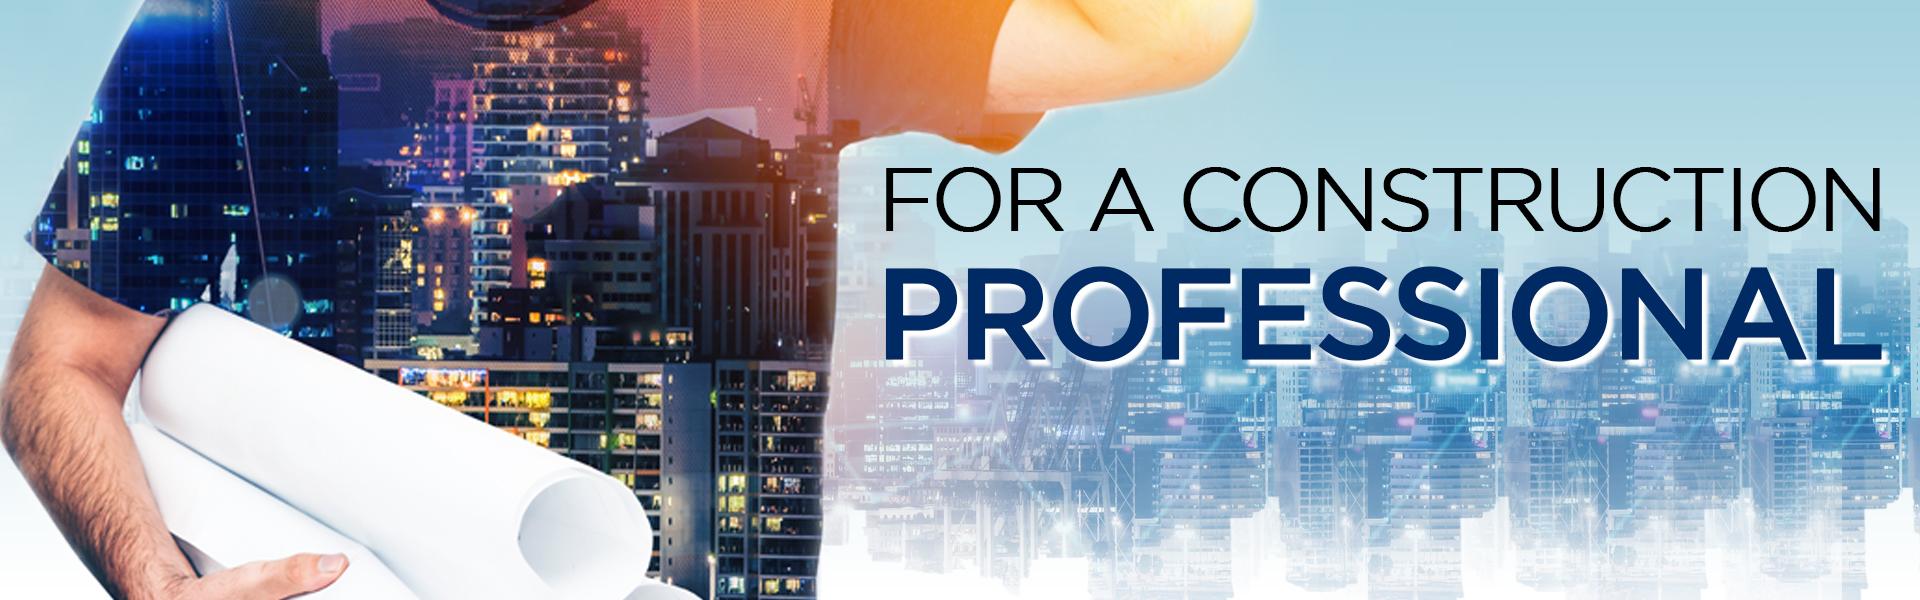 professionalpage_hero-banner